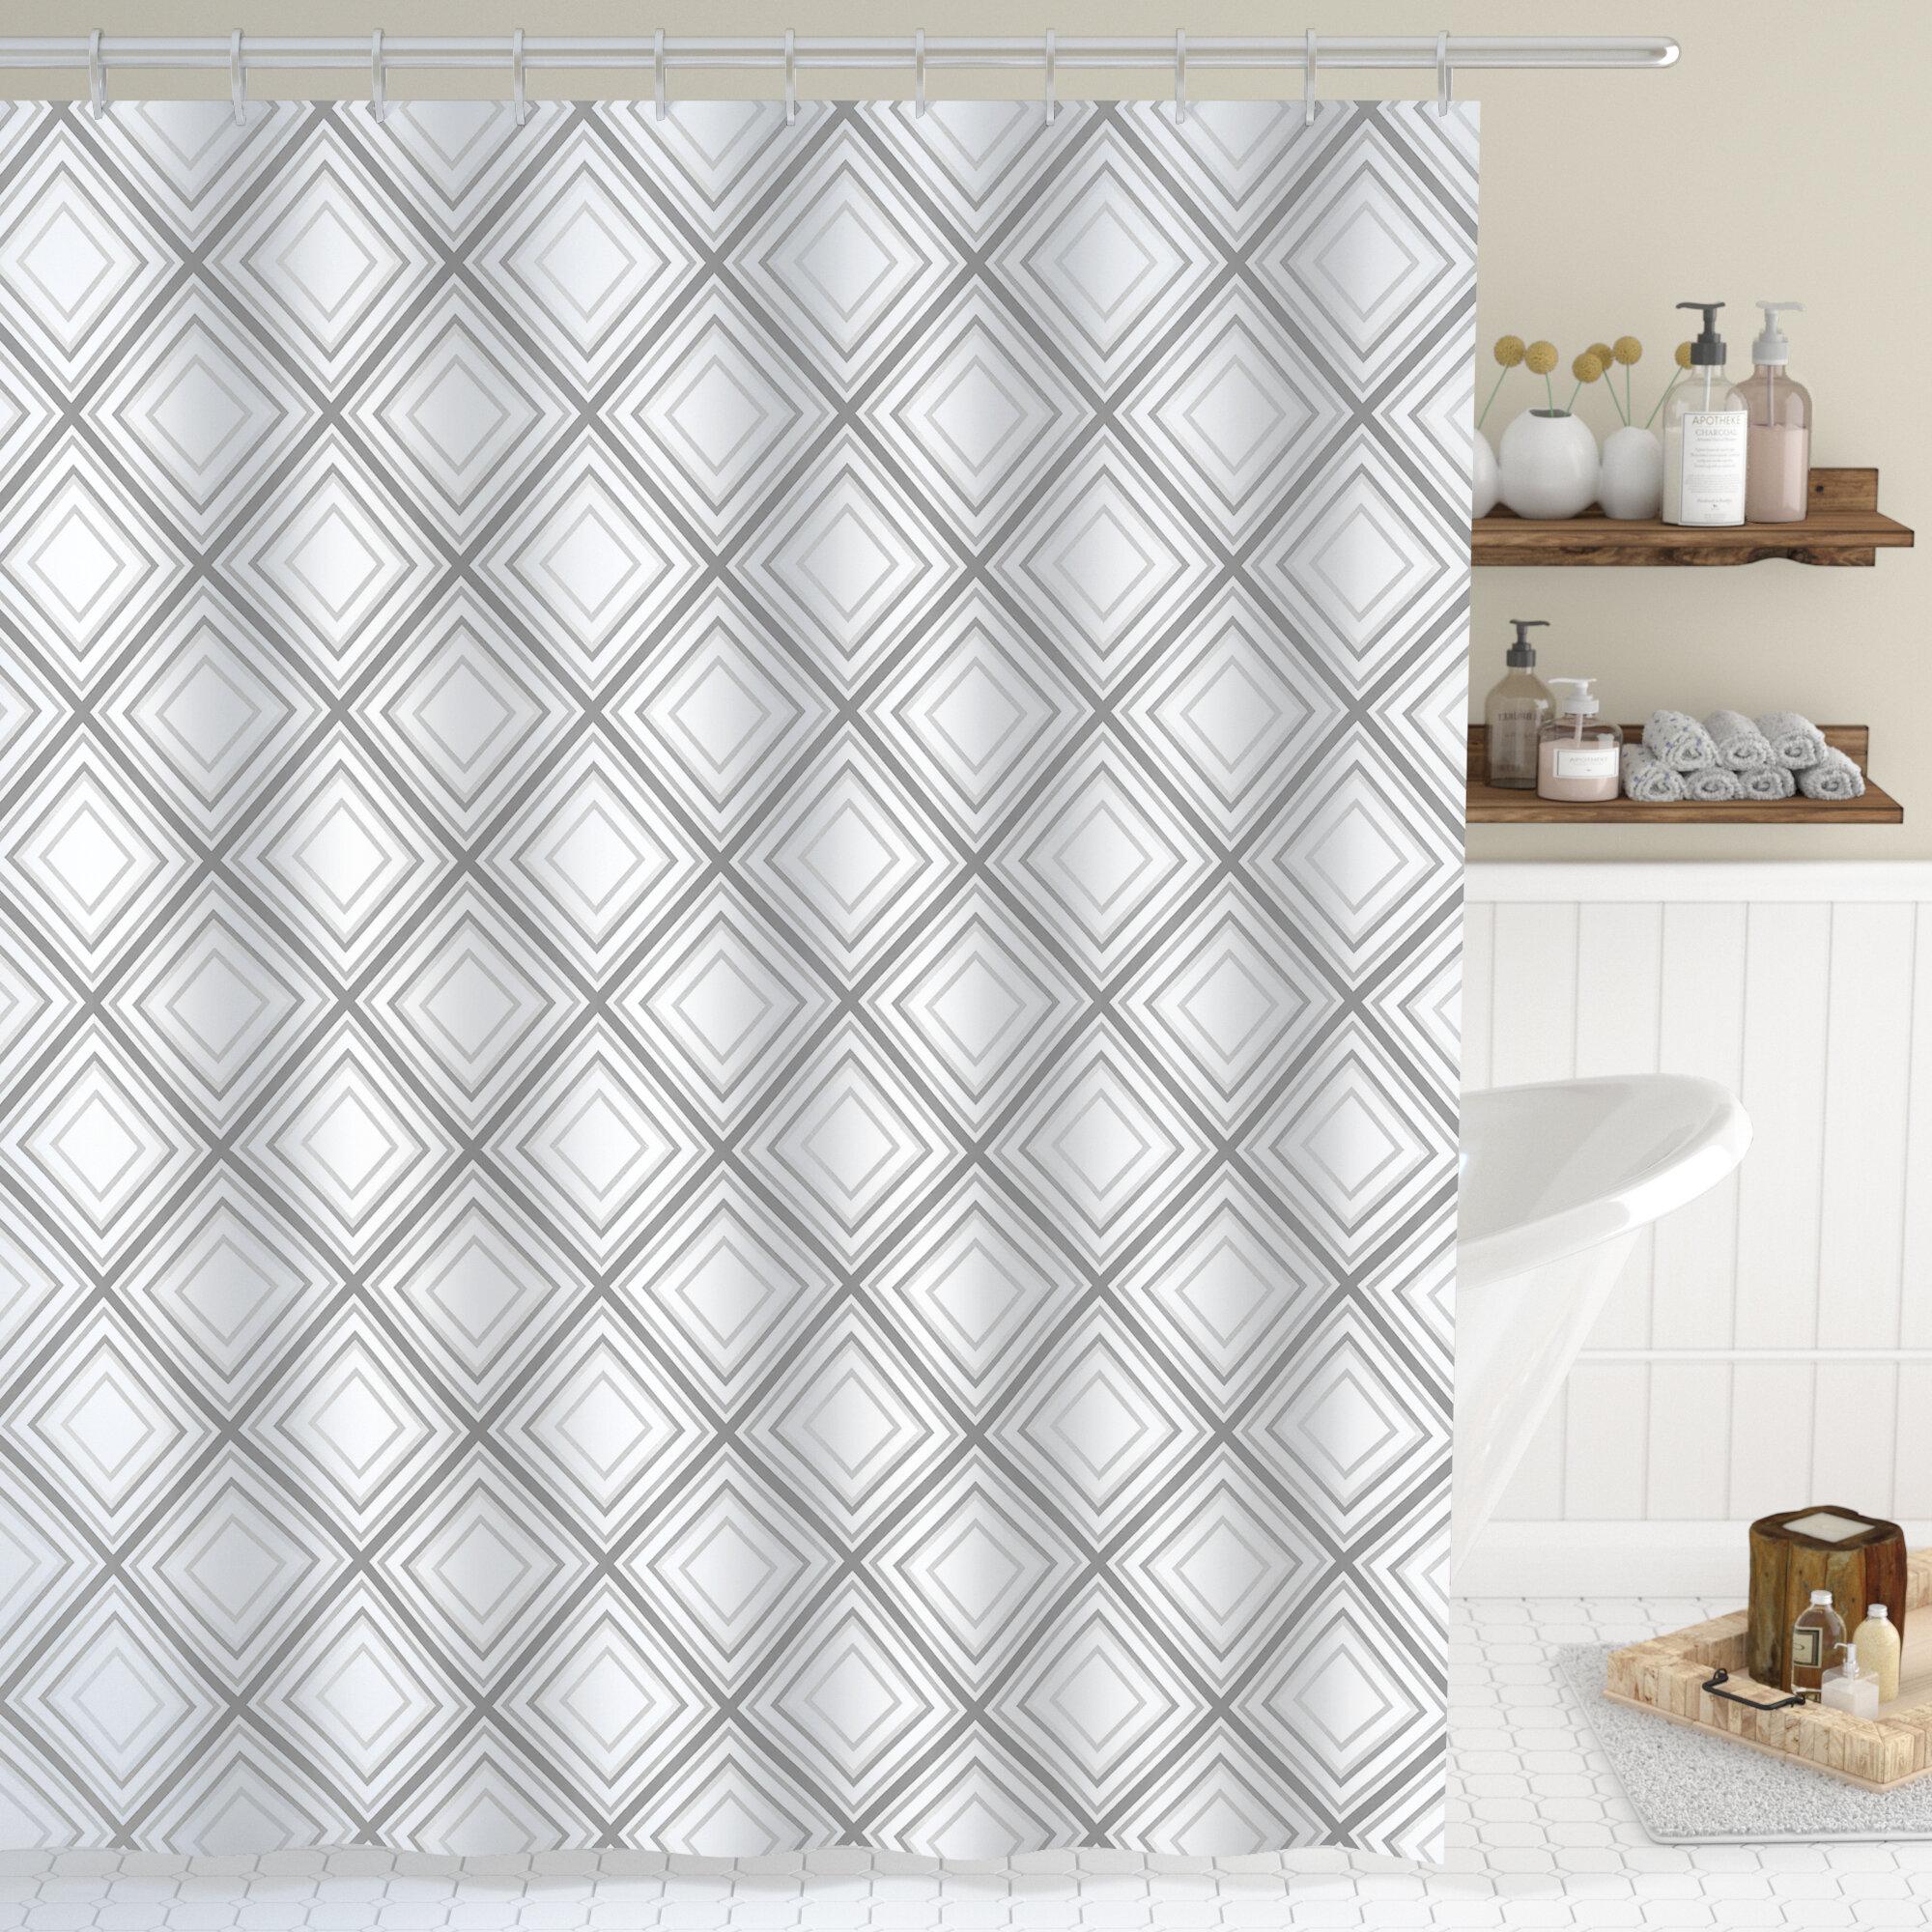 Union Rustic Wyatt Minimalist Squares Shower Curtain | Wayfair